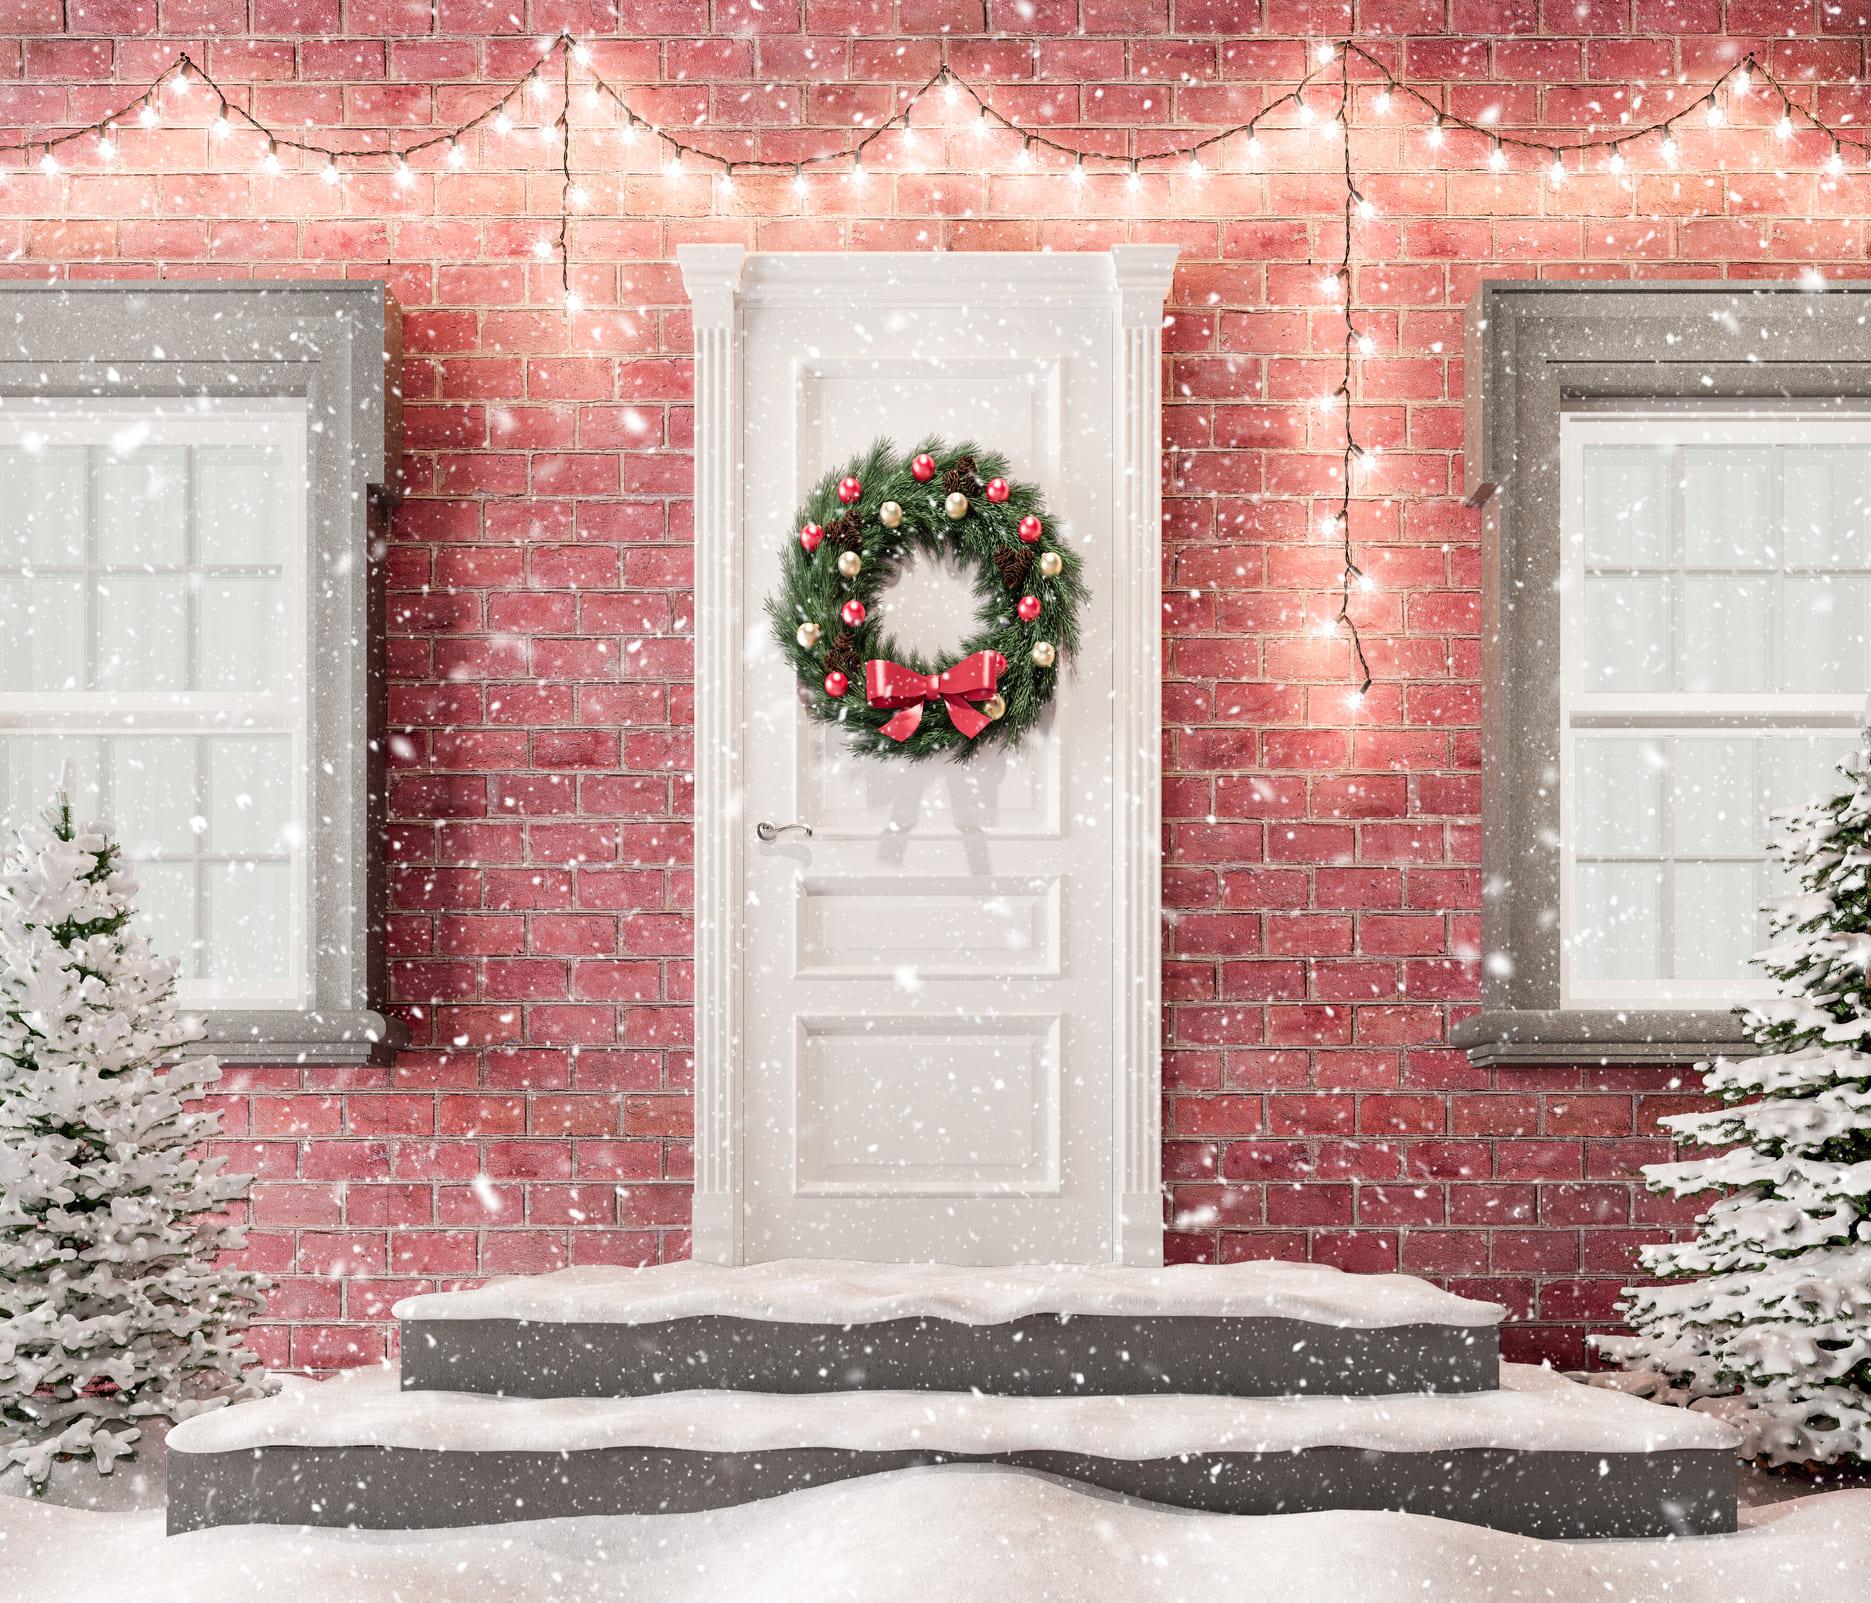 Vender-epoca-navideña